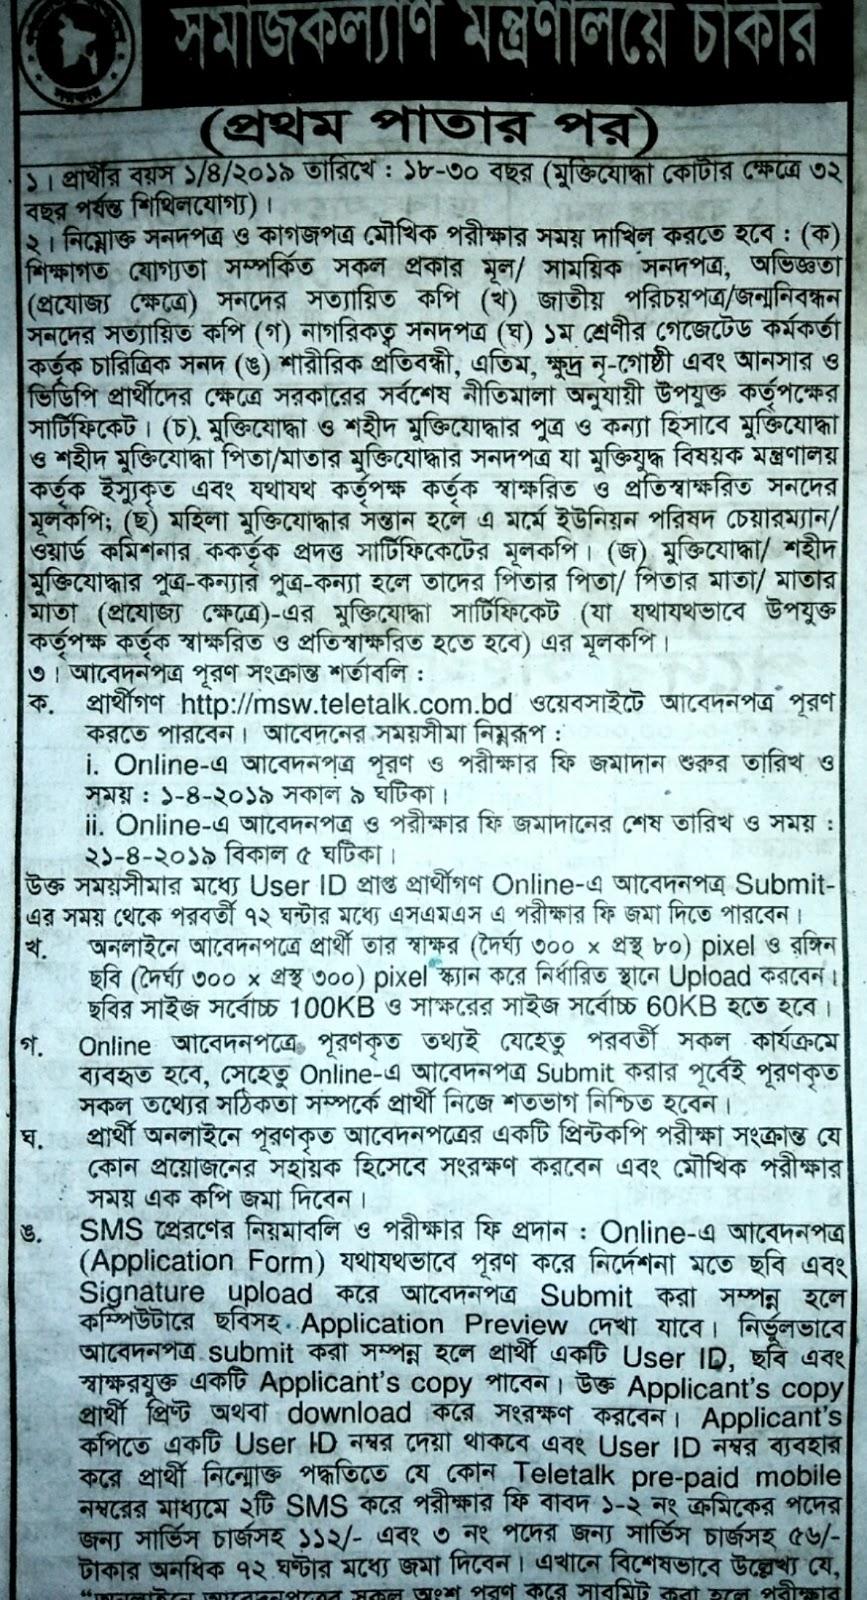 Social Welfare Ministry job circular 2019. সমাজকল্যান মন্ত্রণালয় নিয়োগ বিজ্ঞপ্তি ২০১৯